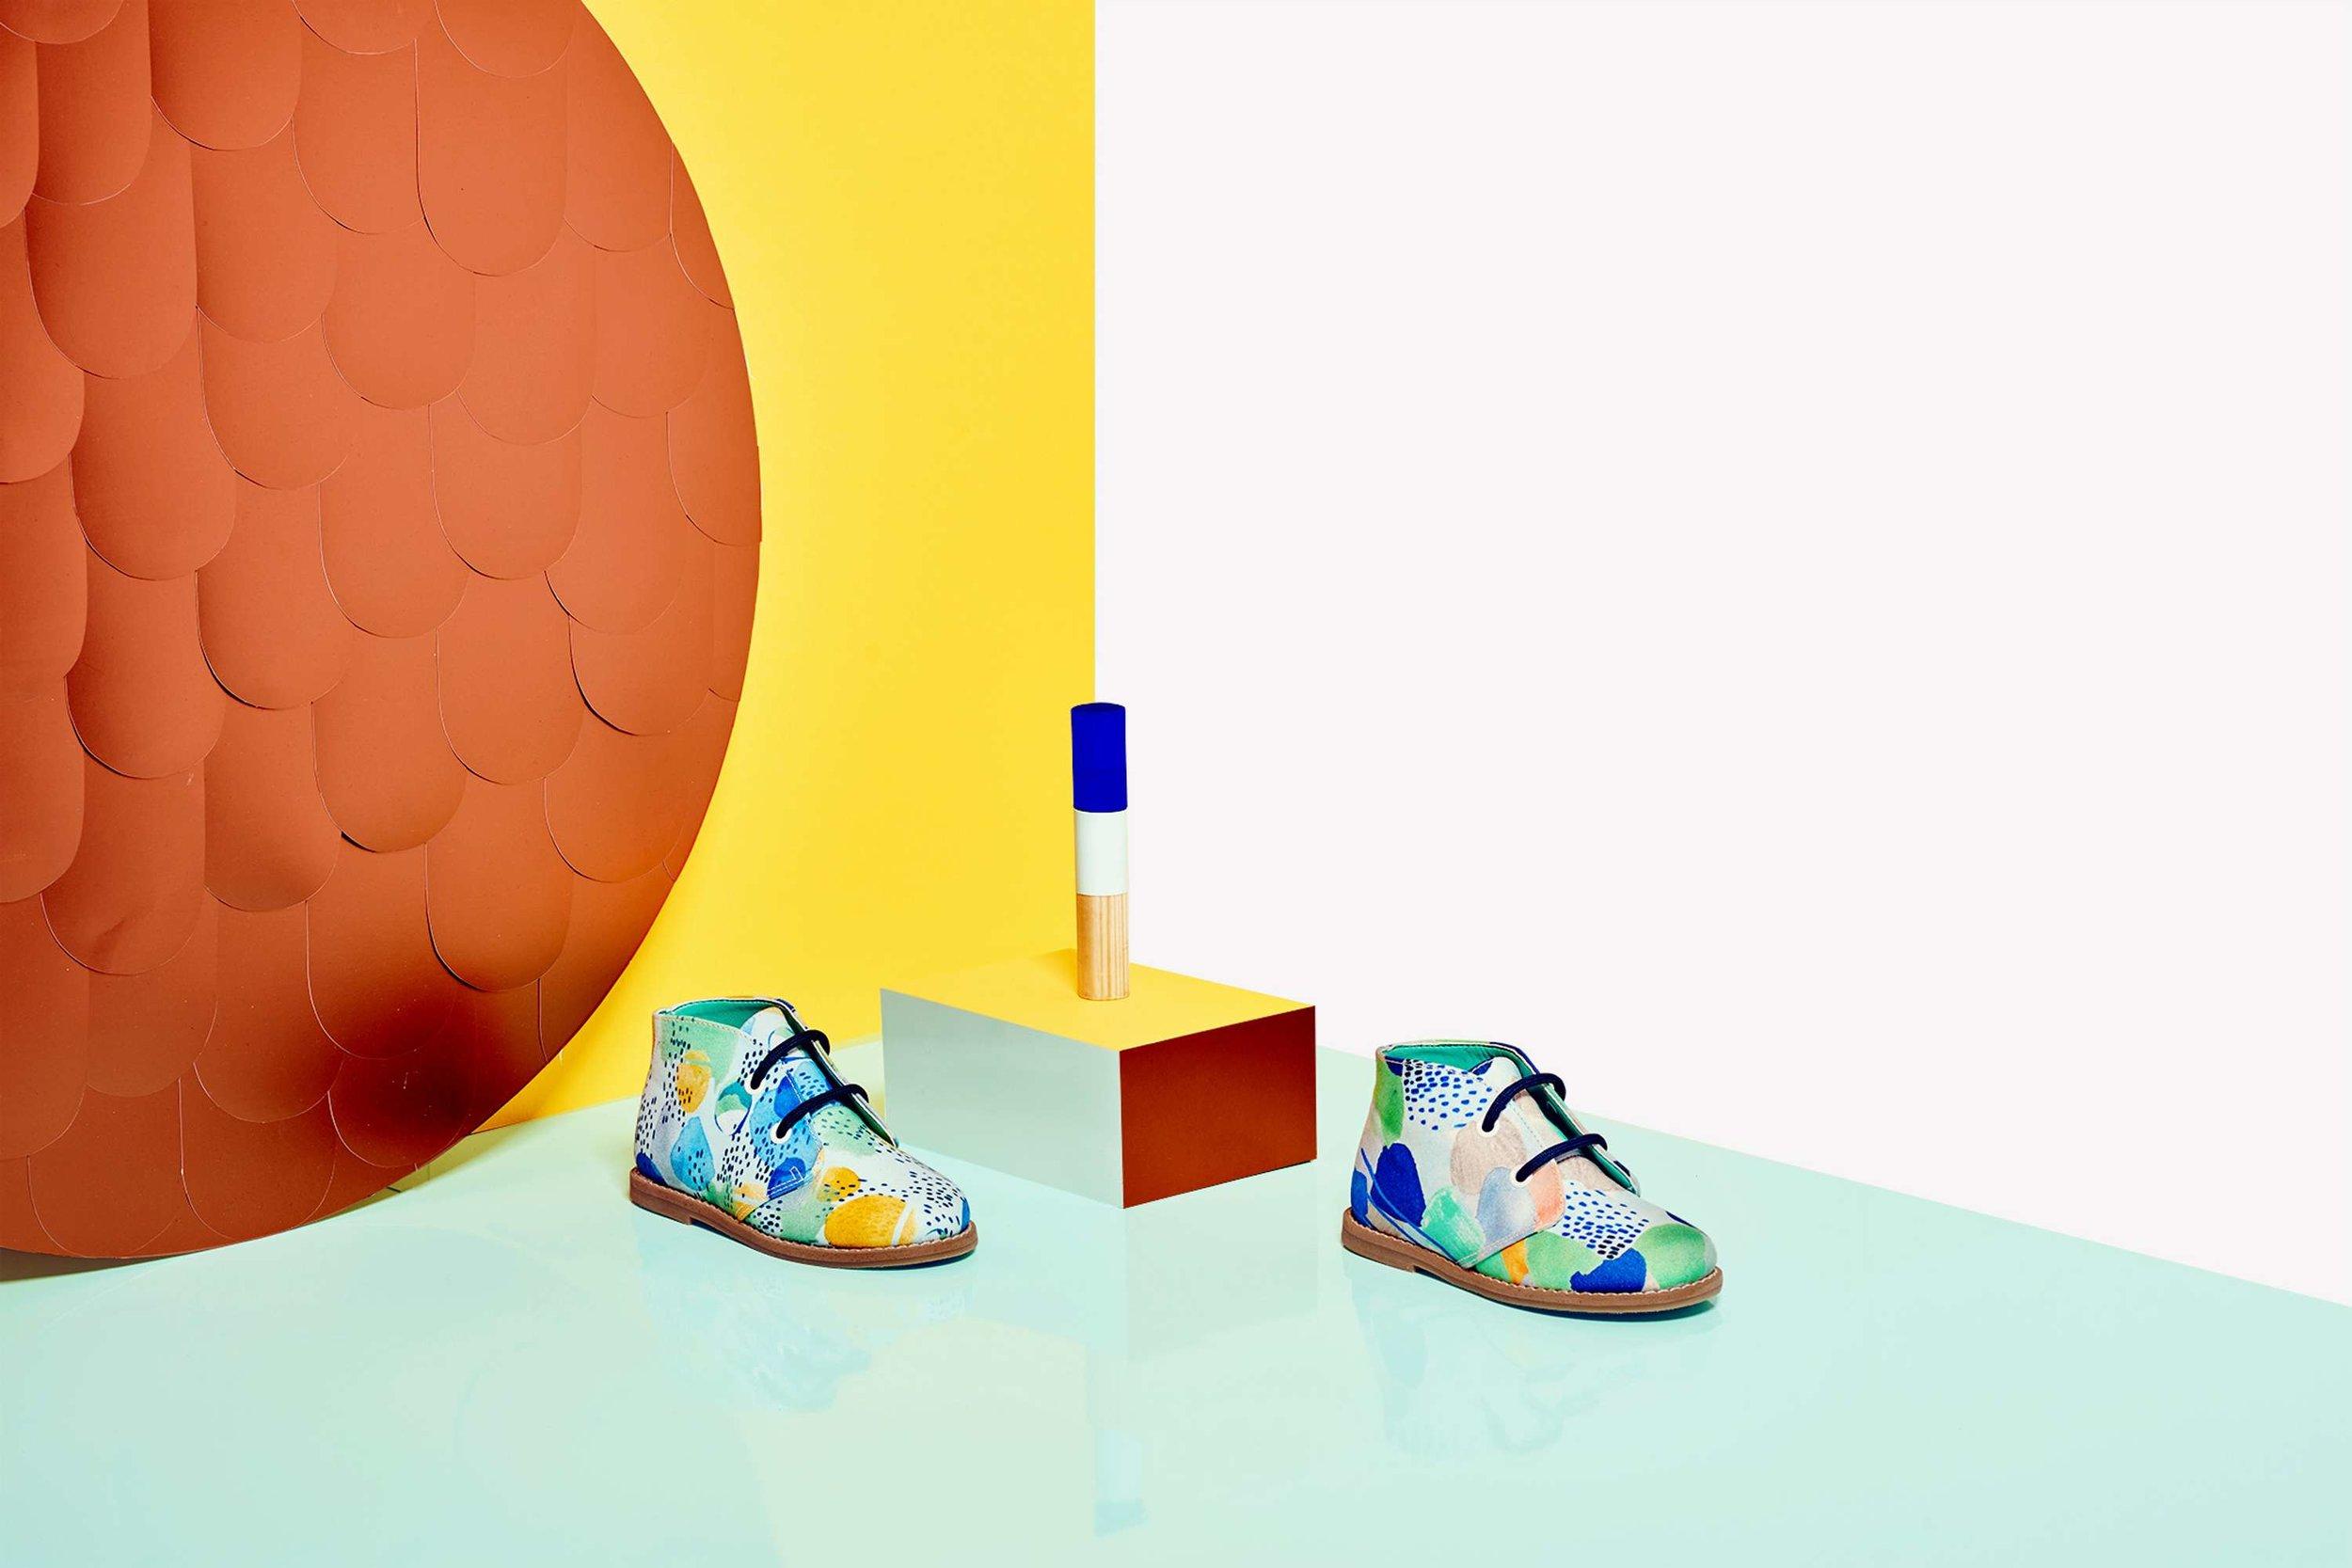 Melula Branding, identity, motion, social, web design, shoe design , packaging and art direction are all done by April / Soeren Hougesen &Louise Moellermark